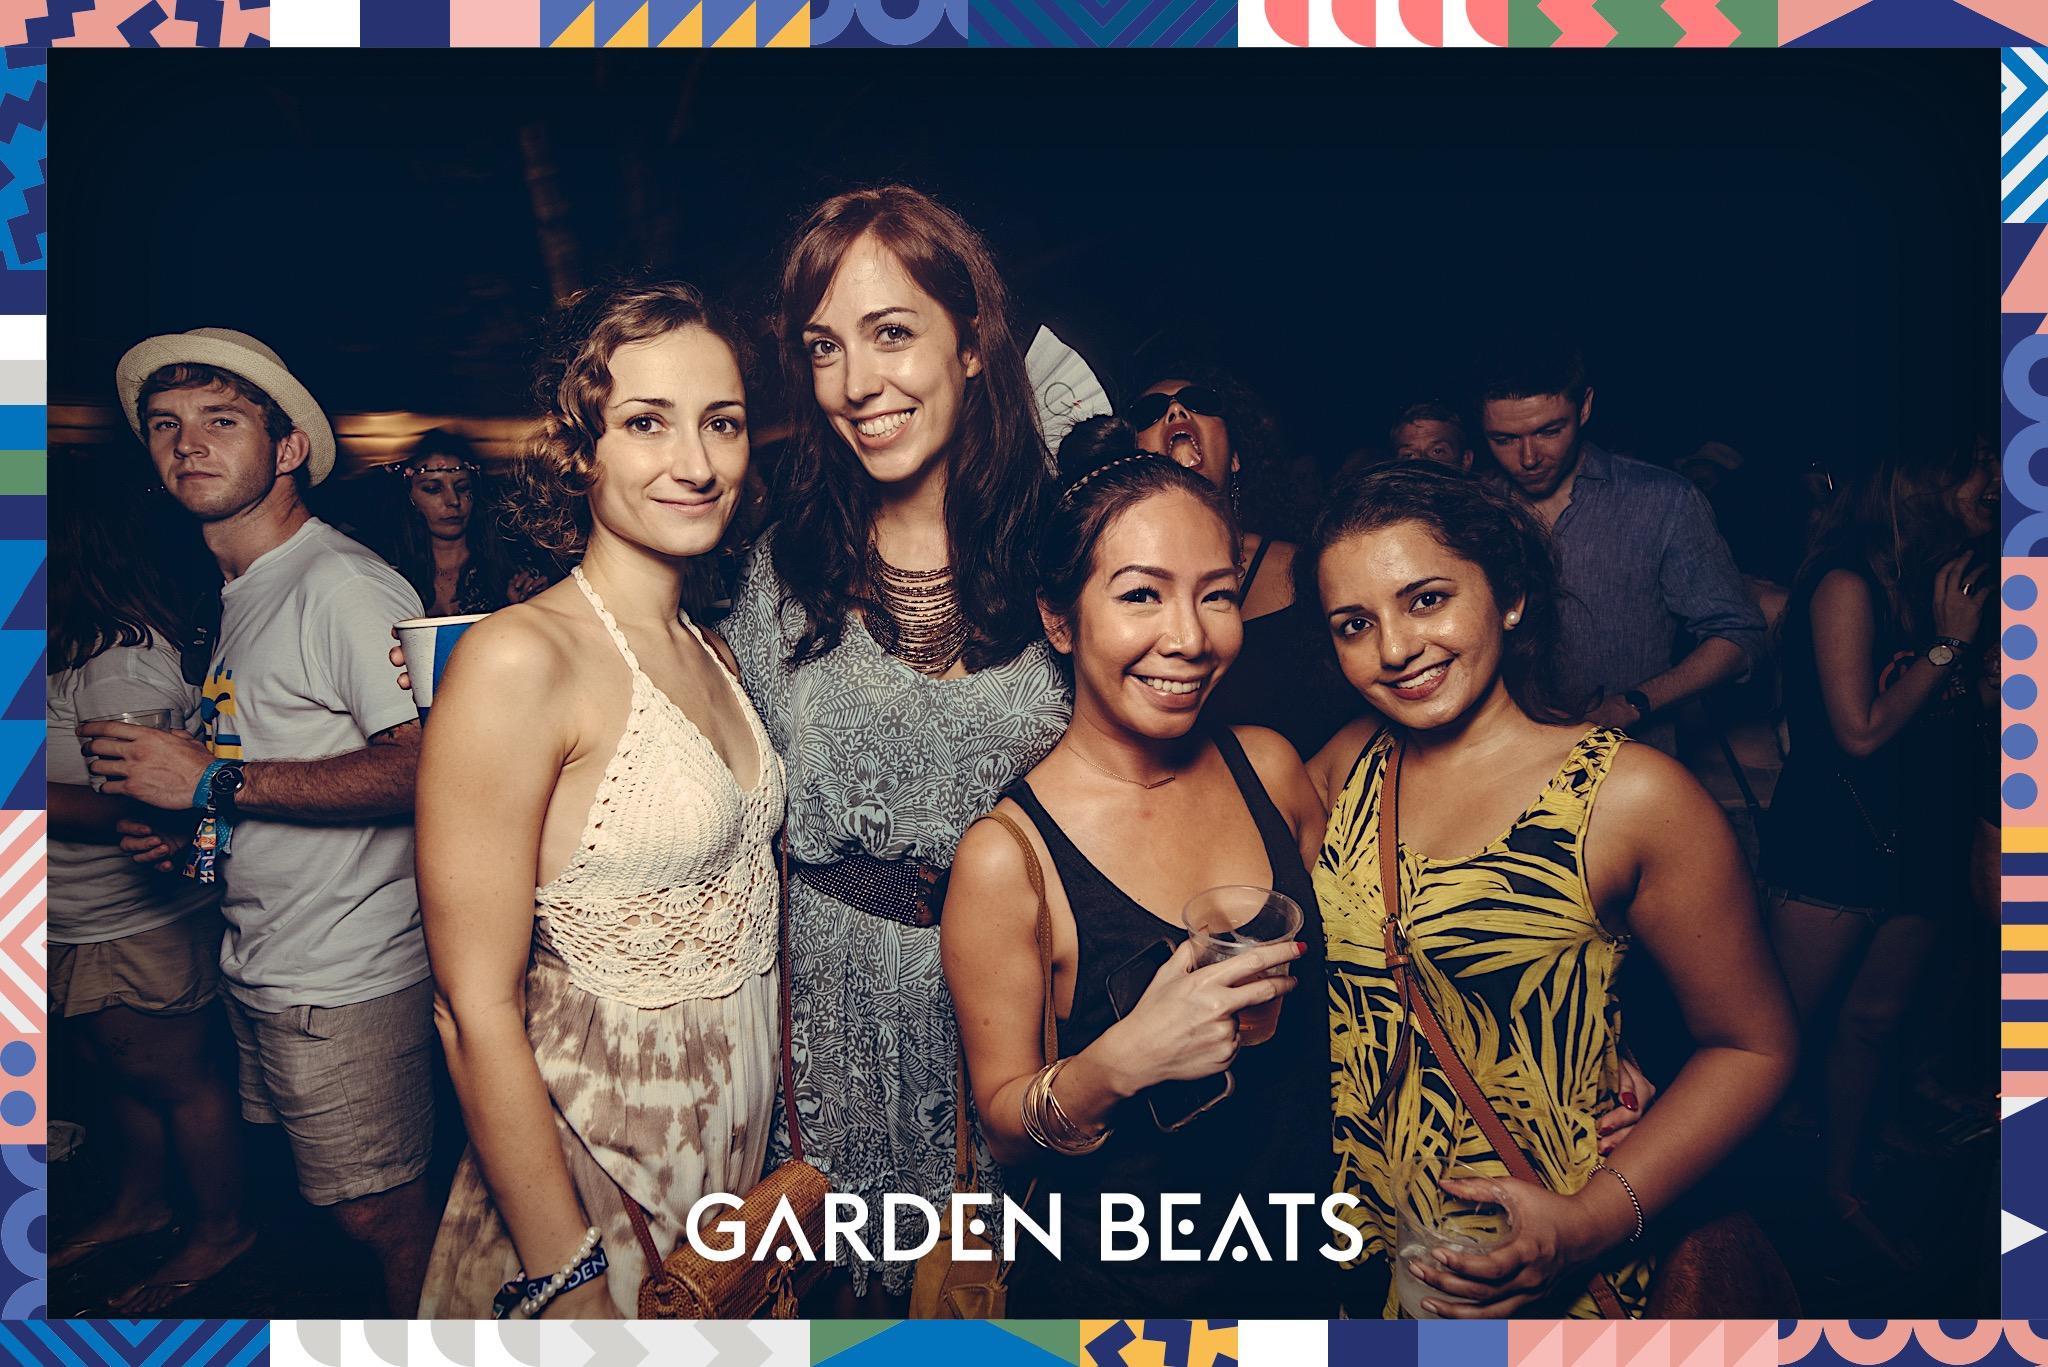 18032017_GardenBeats_Colossal743_WatermarkedGB.jpg